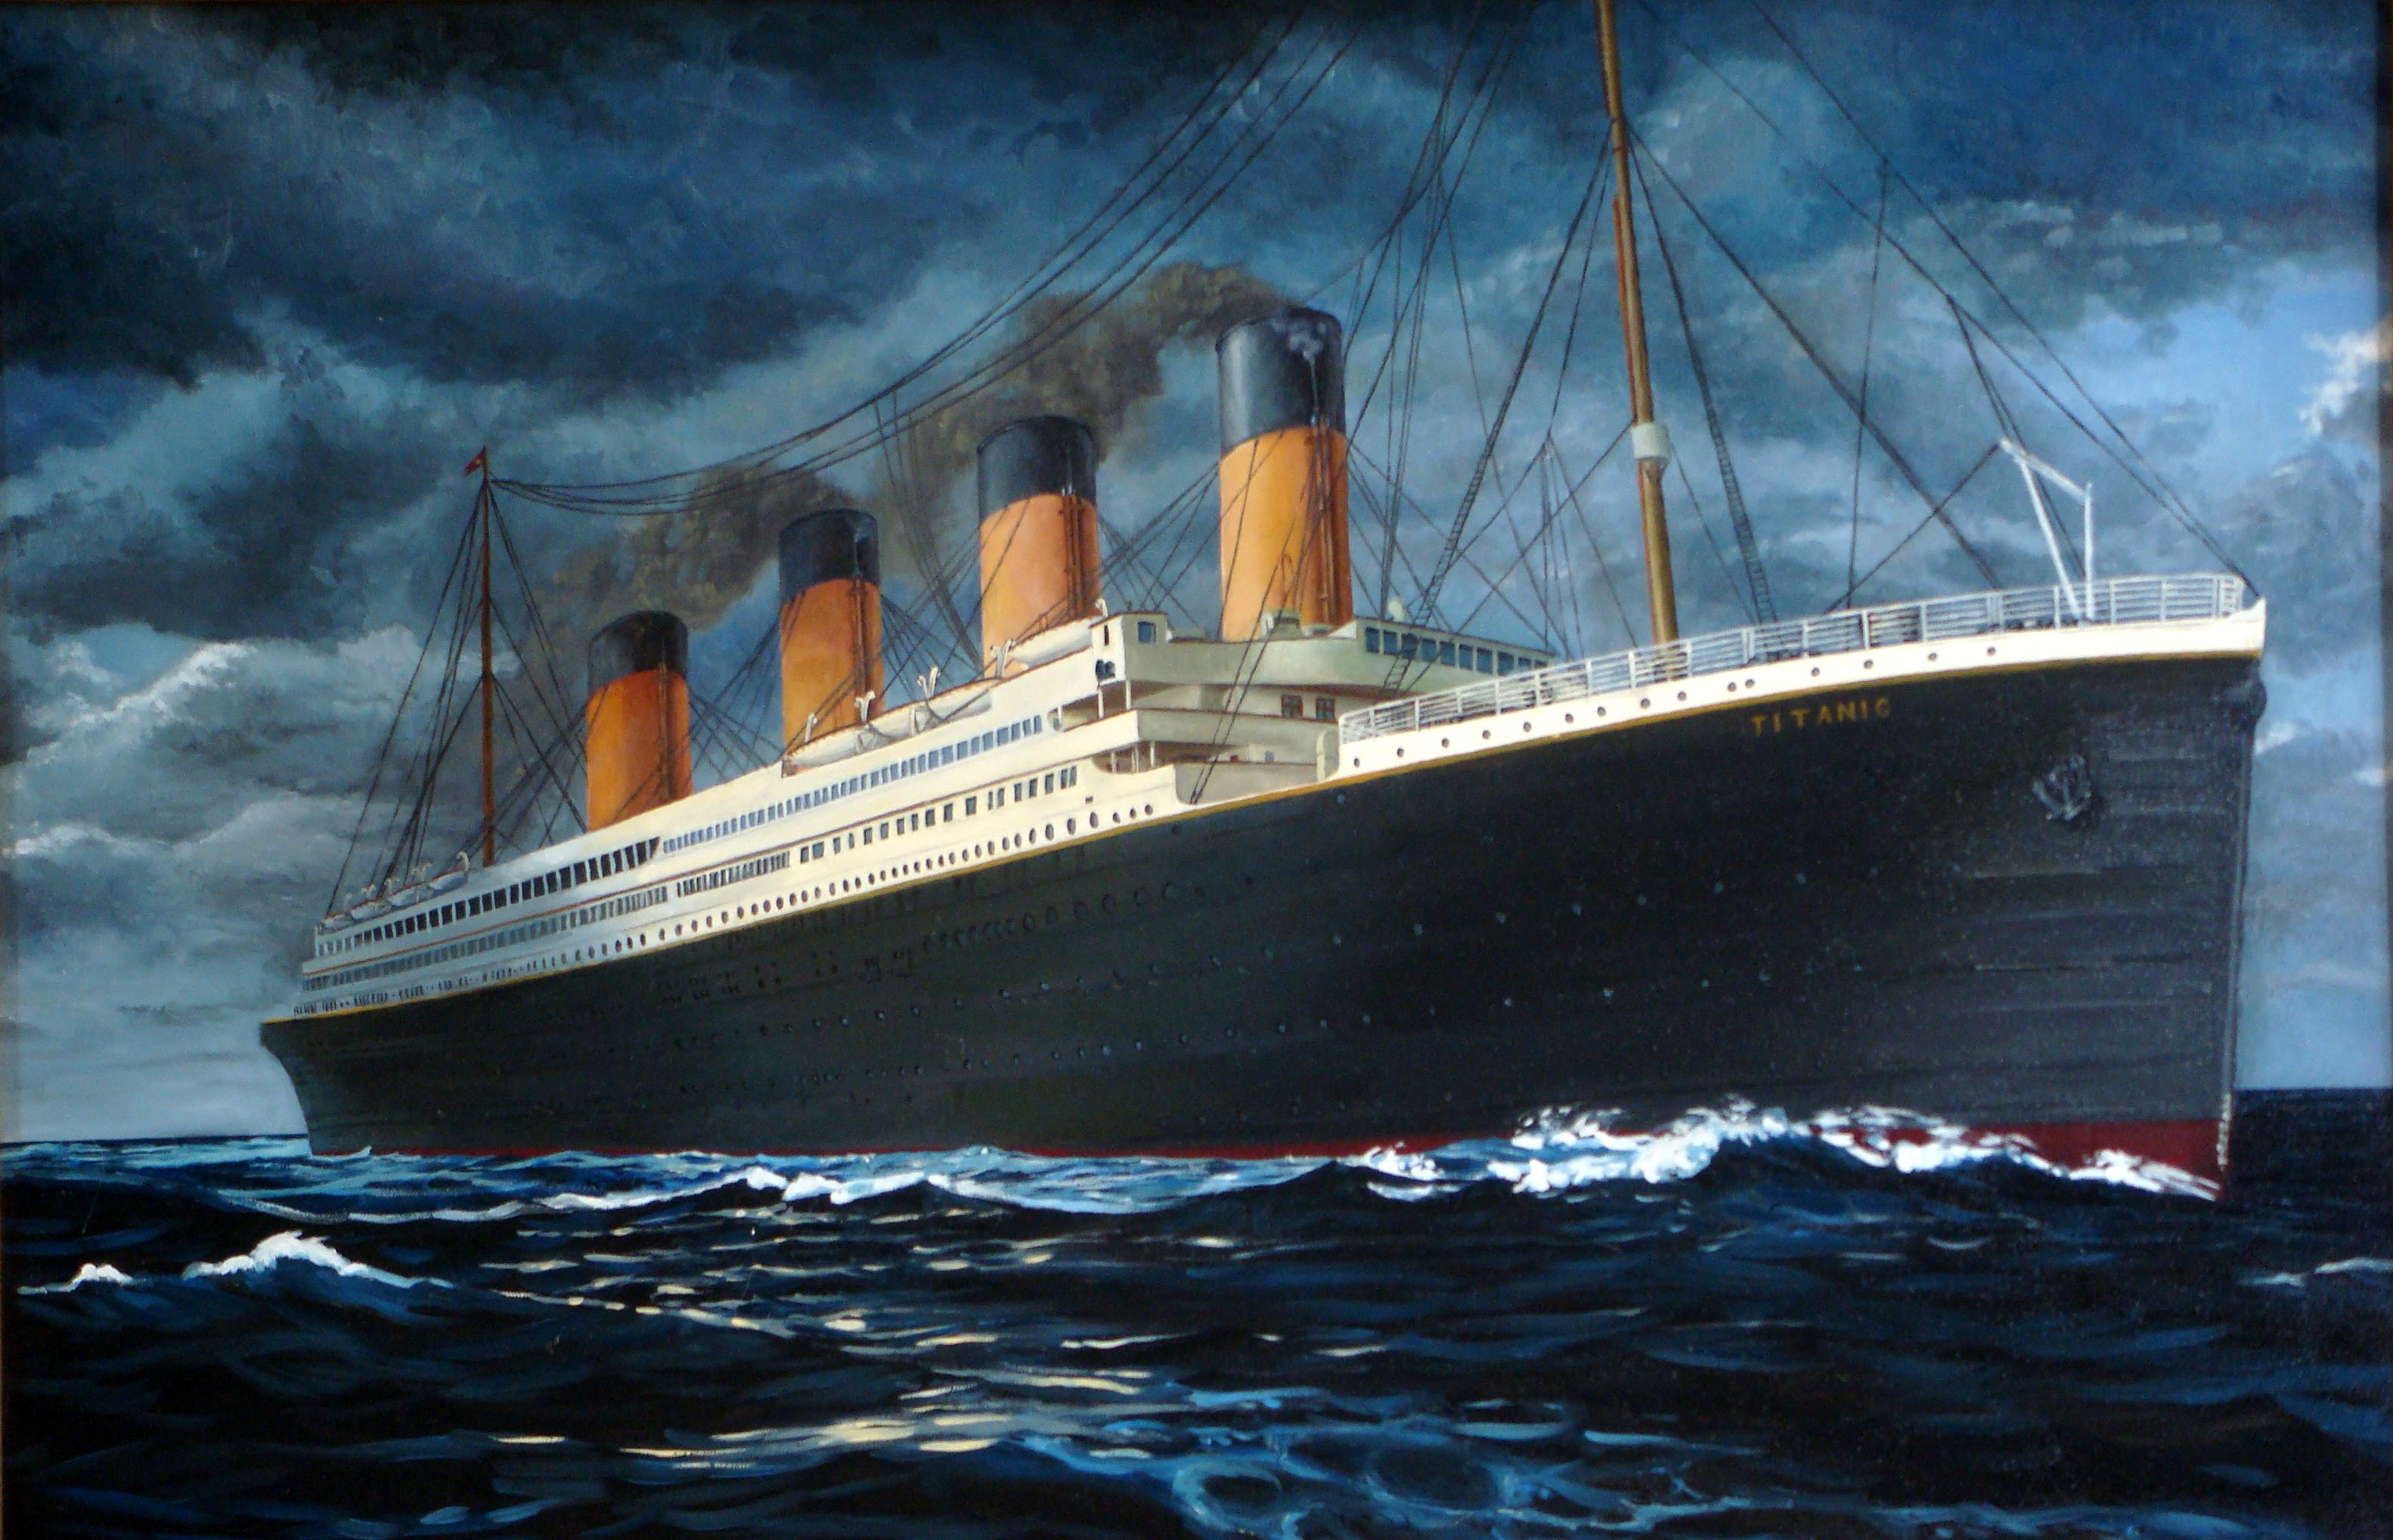 Titanic-Marschal Copy Study by amadscientist on DeviantArt